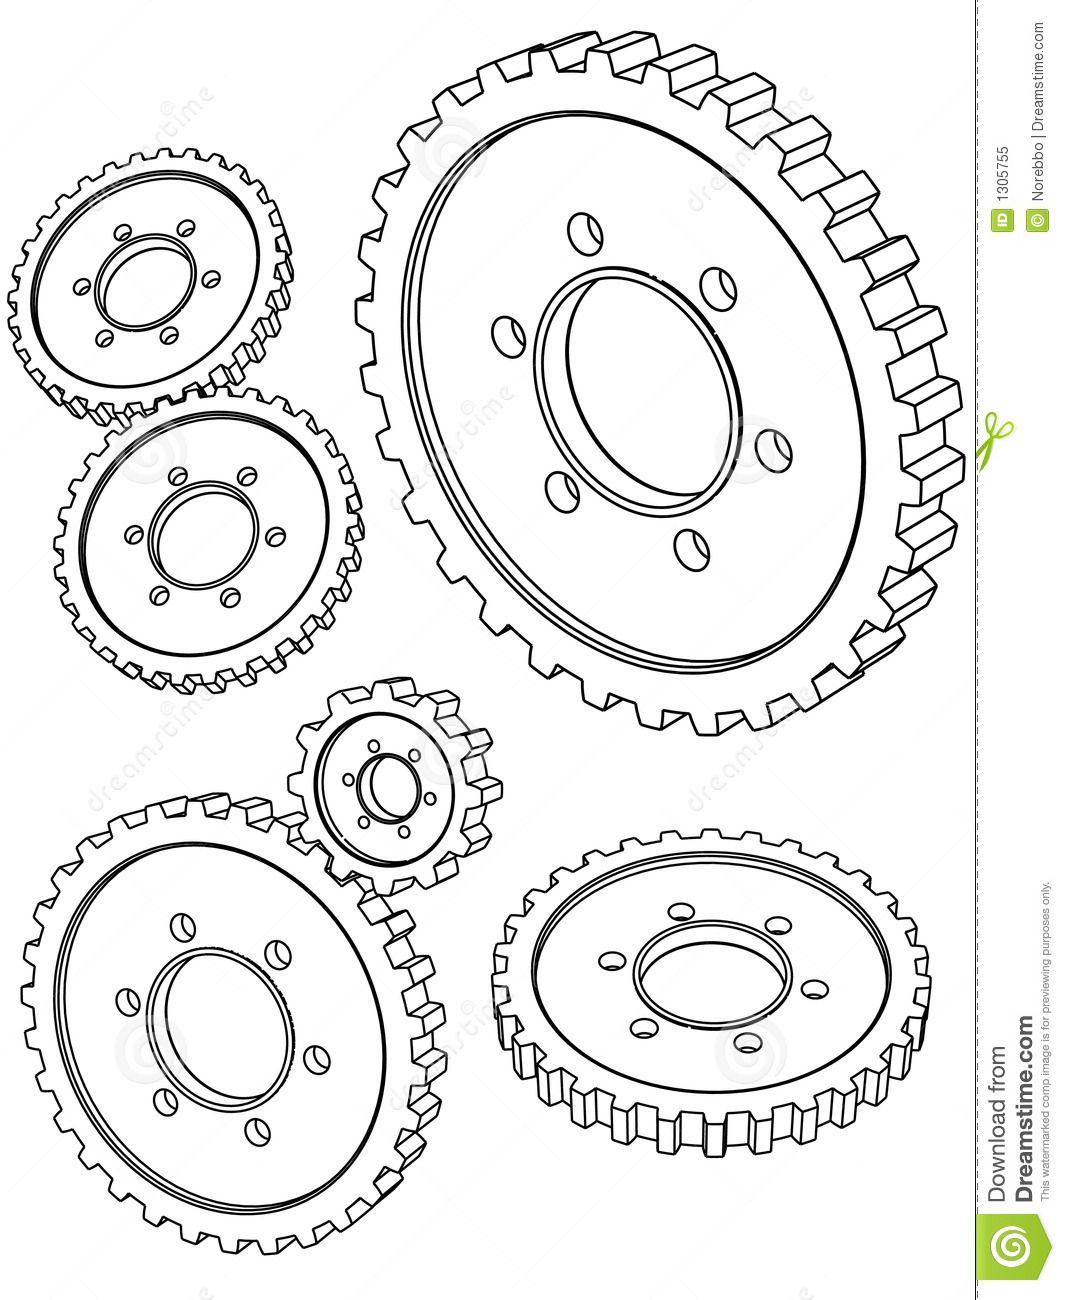 Pin Pontiac Fuse Box Diagrams Ajilbabcom Portal On Pinterest